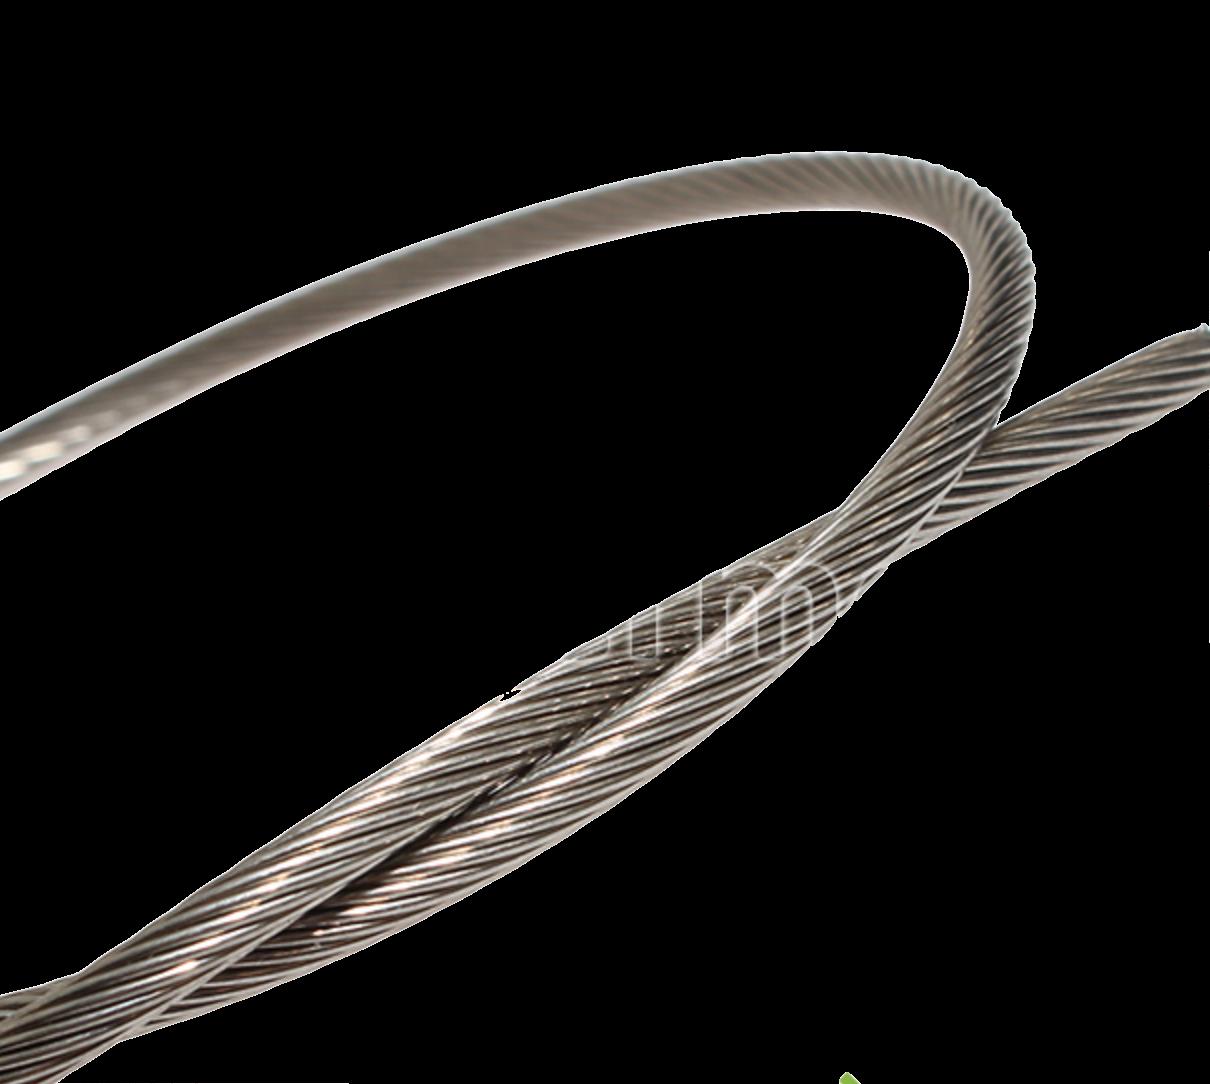 Трос нержавеющий для линий кормления Ø 5 мм